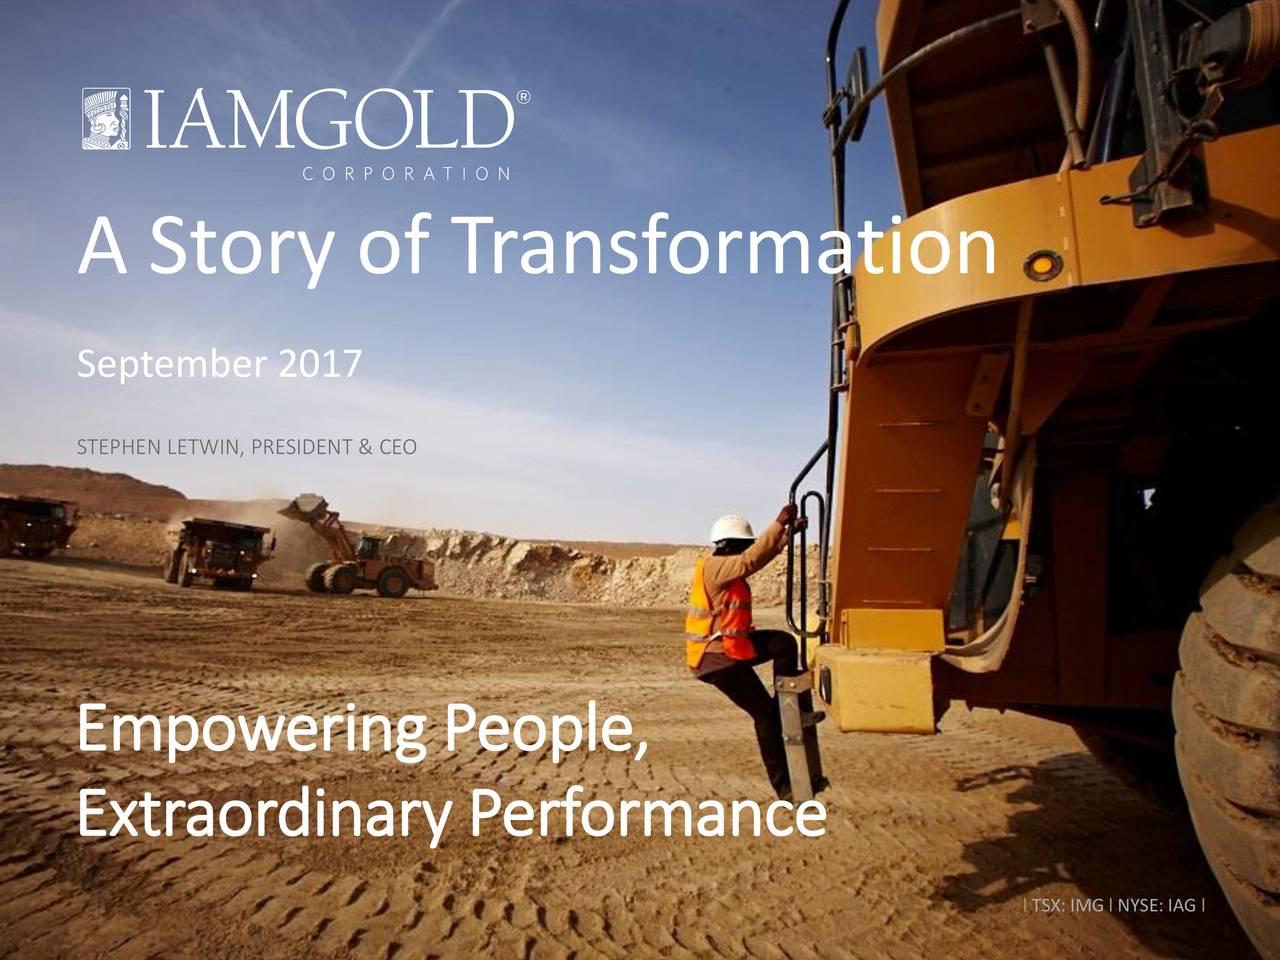 IAMGOLD (IAG) Presents At 2017 Denver Gold Forum - Slideshow